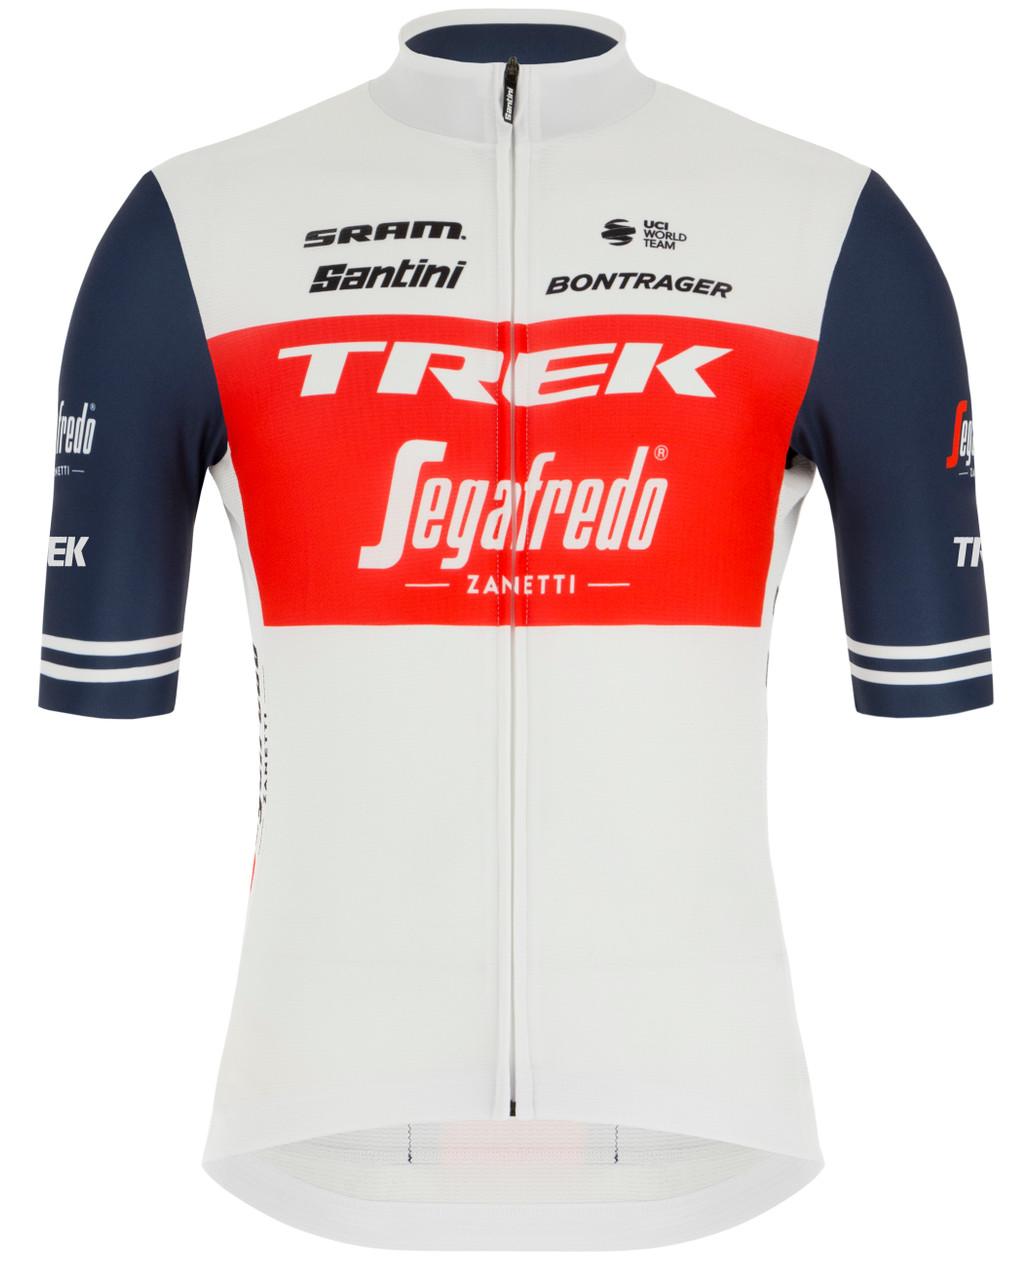 2021 Trek Segafredo Jersey